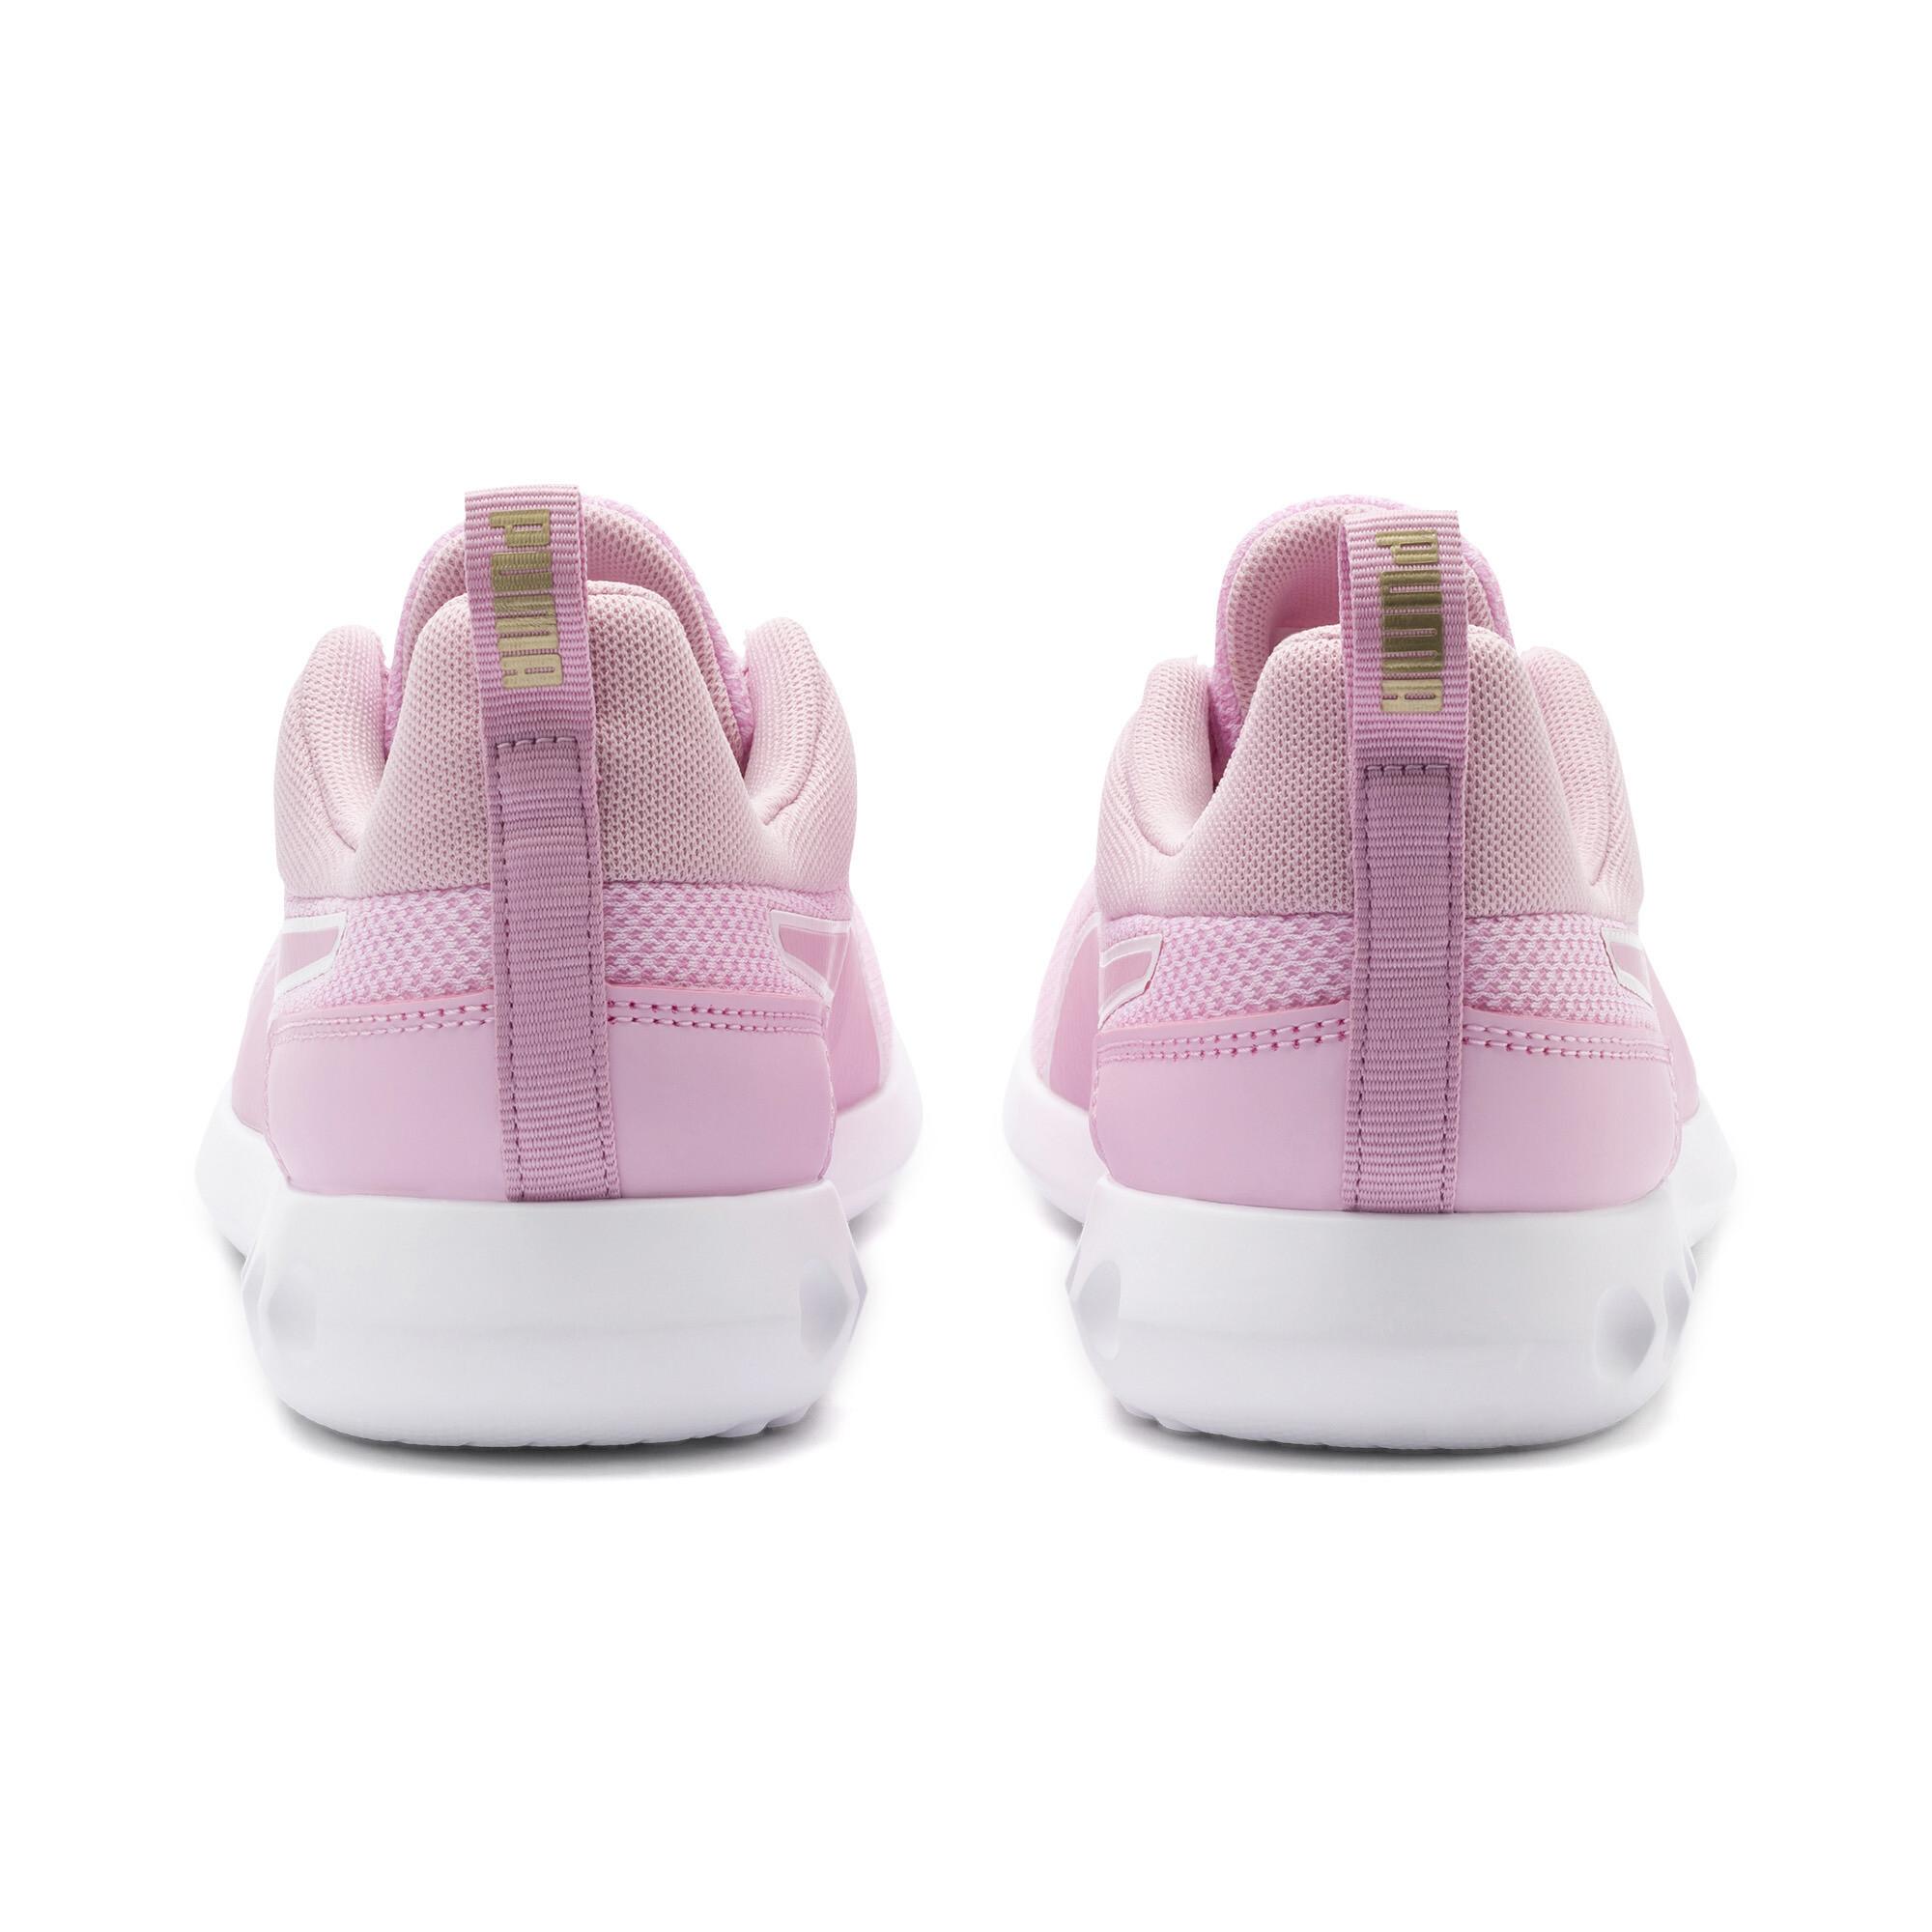 PUMA-Carson-2-Concave-Women-s-Training-Shoes-Women-Shoe-Running thumbnail 9